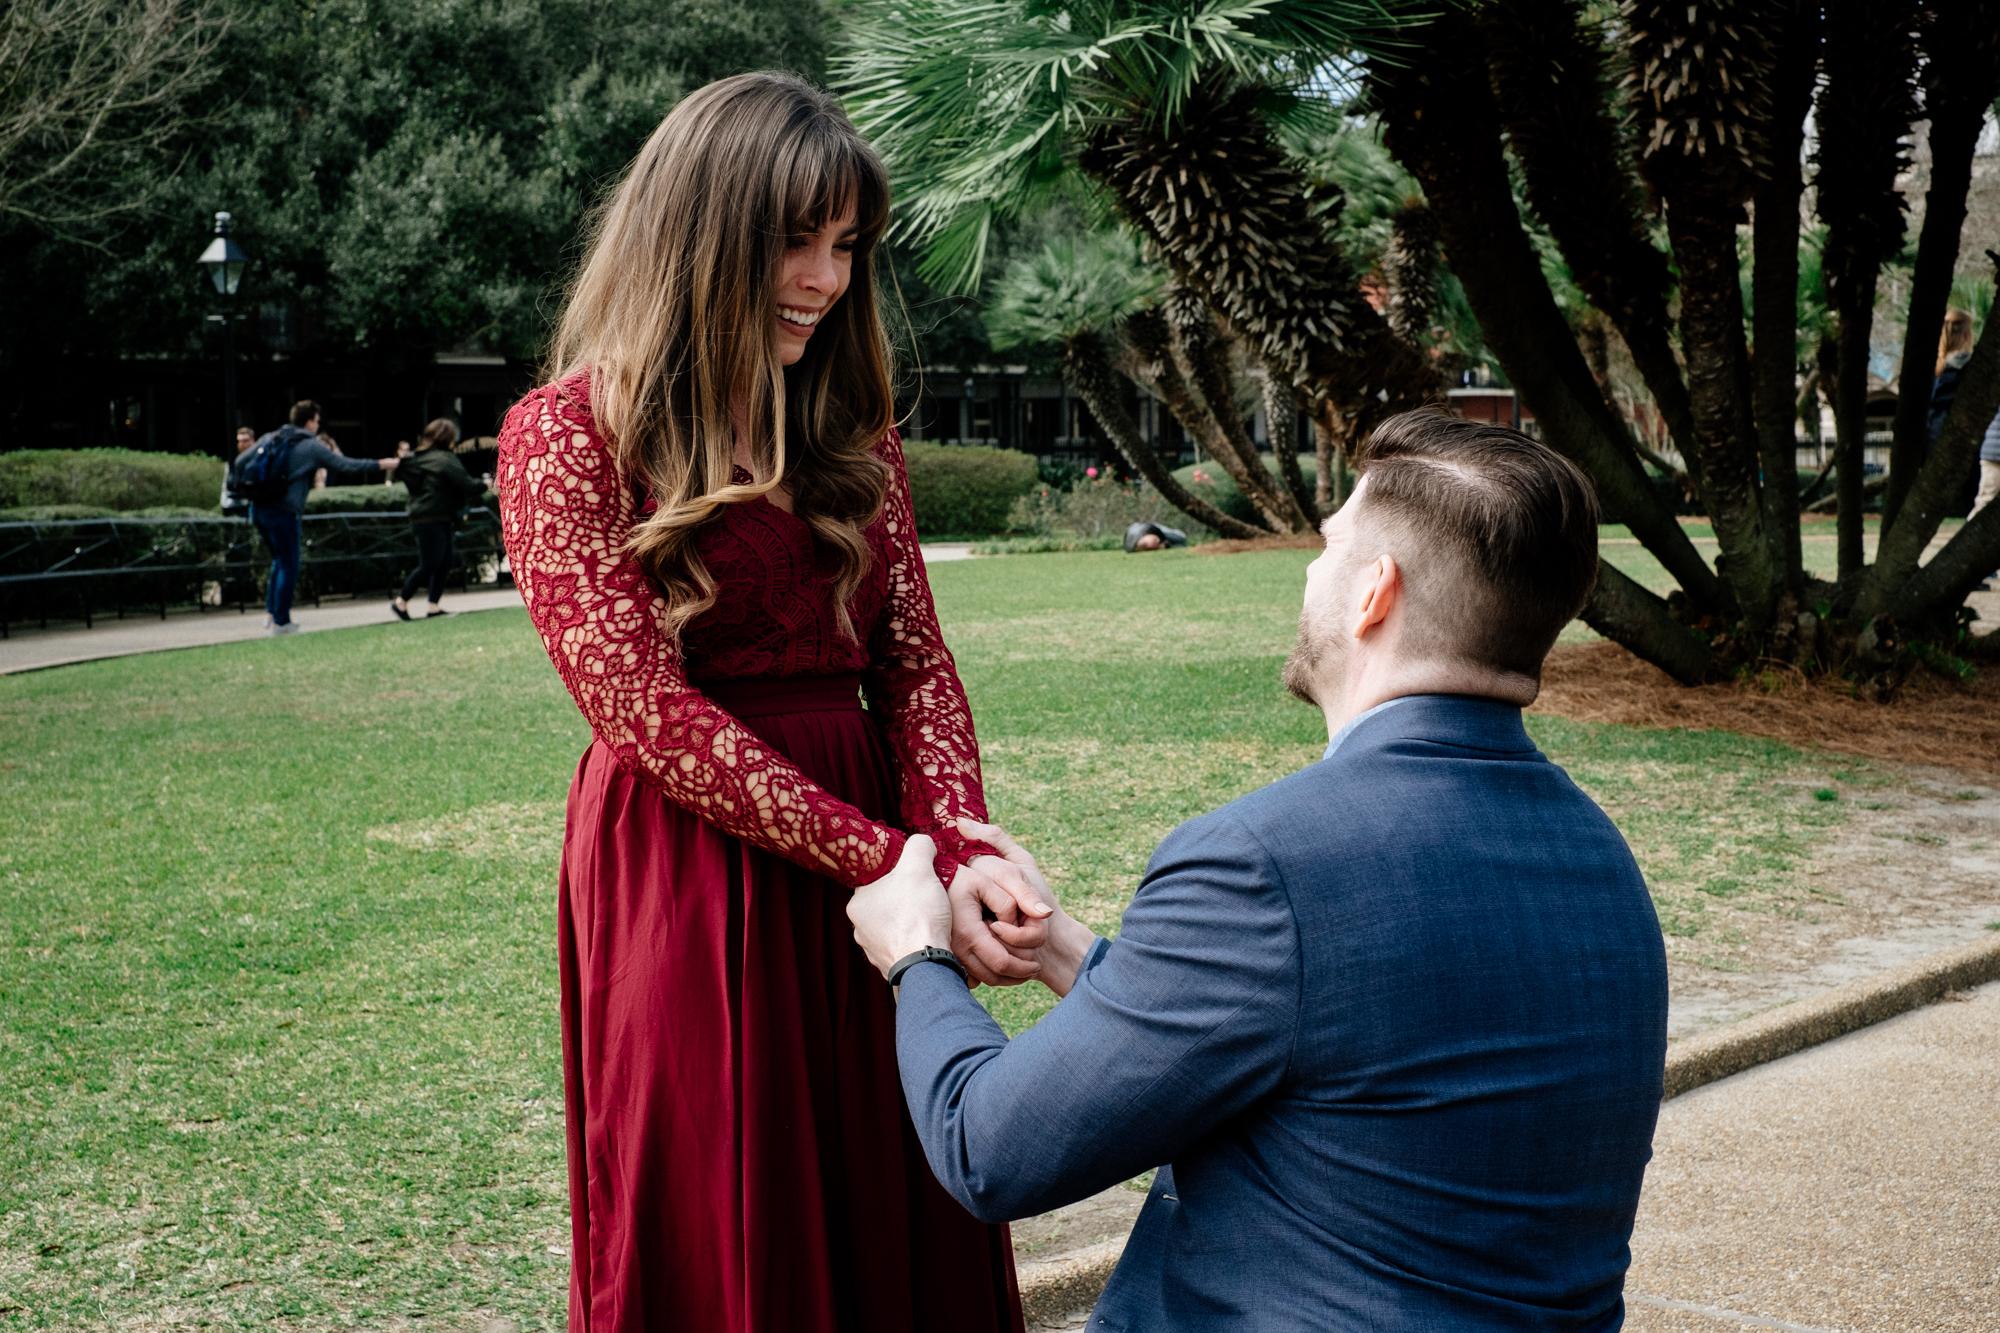 Jen_Montgomery_Photography_Angela_Brian_Engagement_Proposal_FB-6.jpg